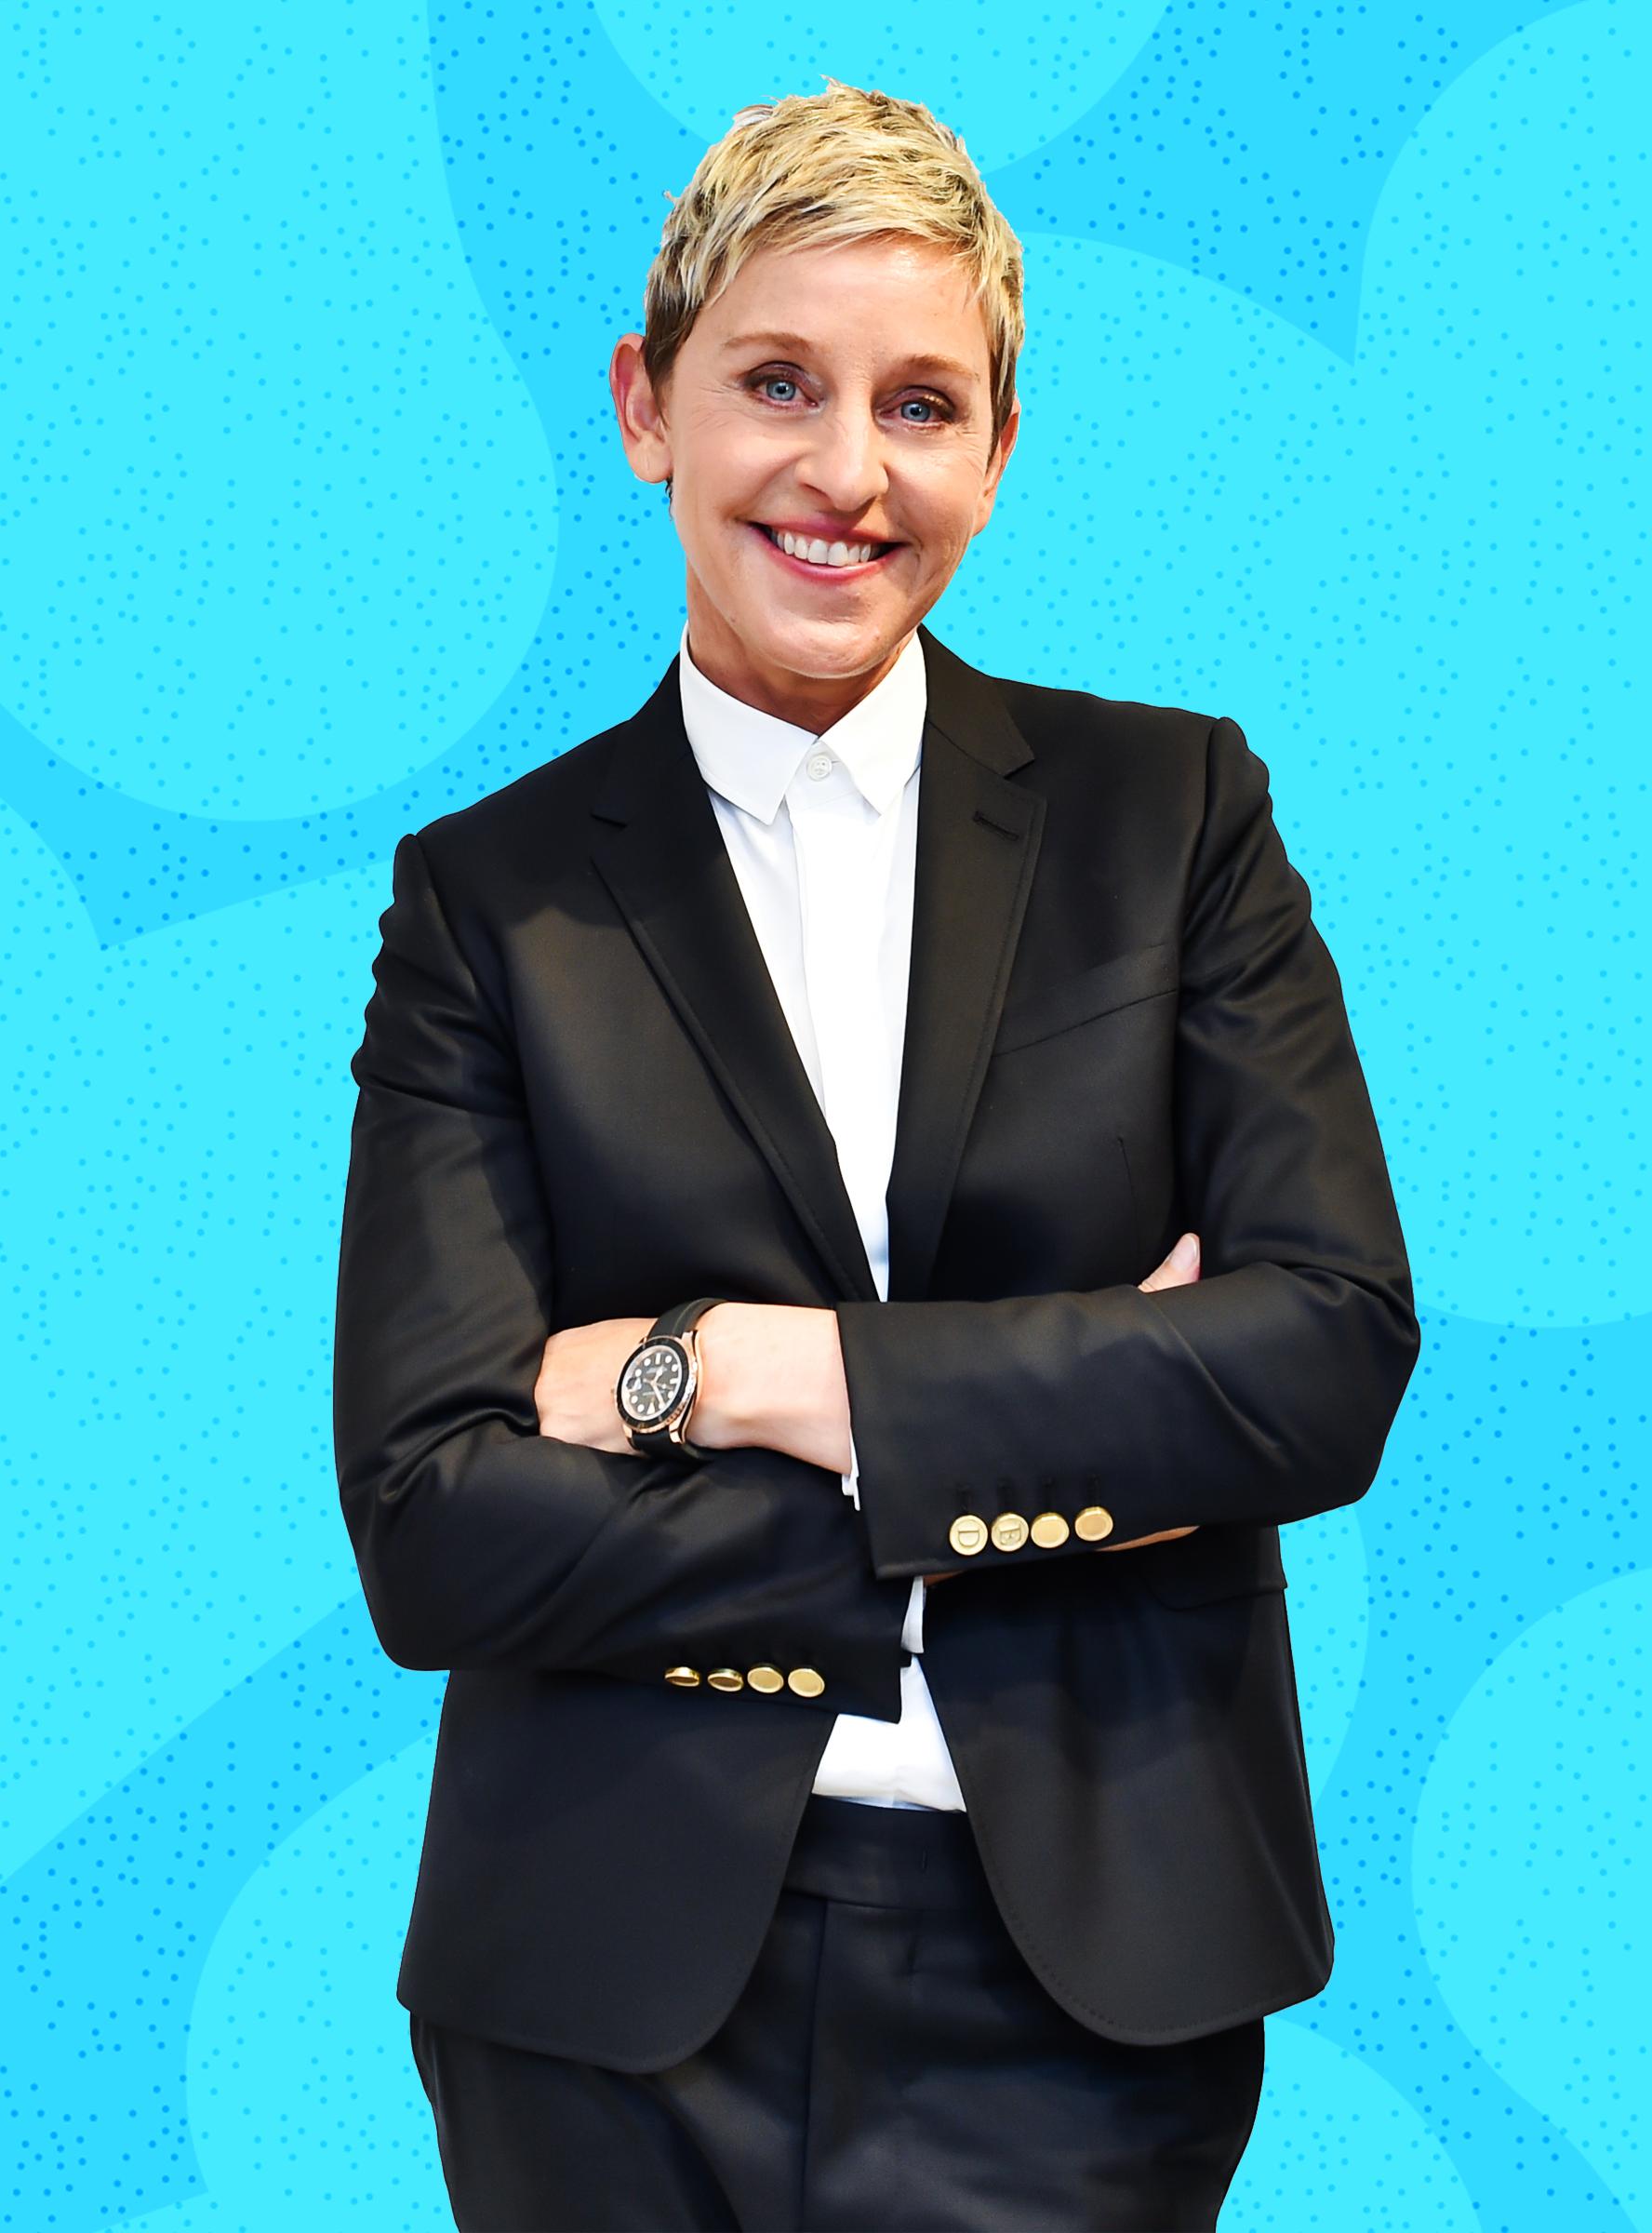 20 Of Ellen Degeneres Greatest Moments Ever Refinery29 Ellen And Portia Ellen Degeneres Ellen Degeneres Birthday